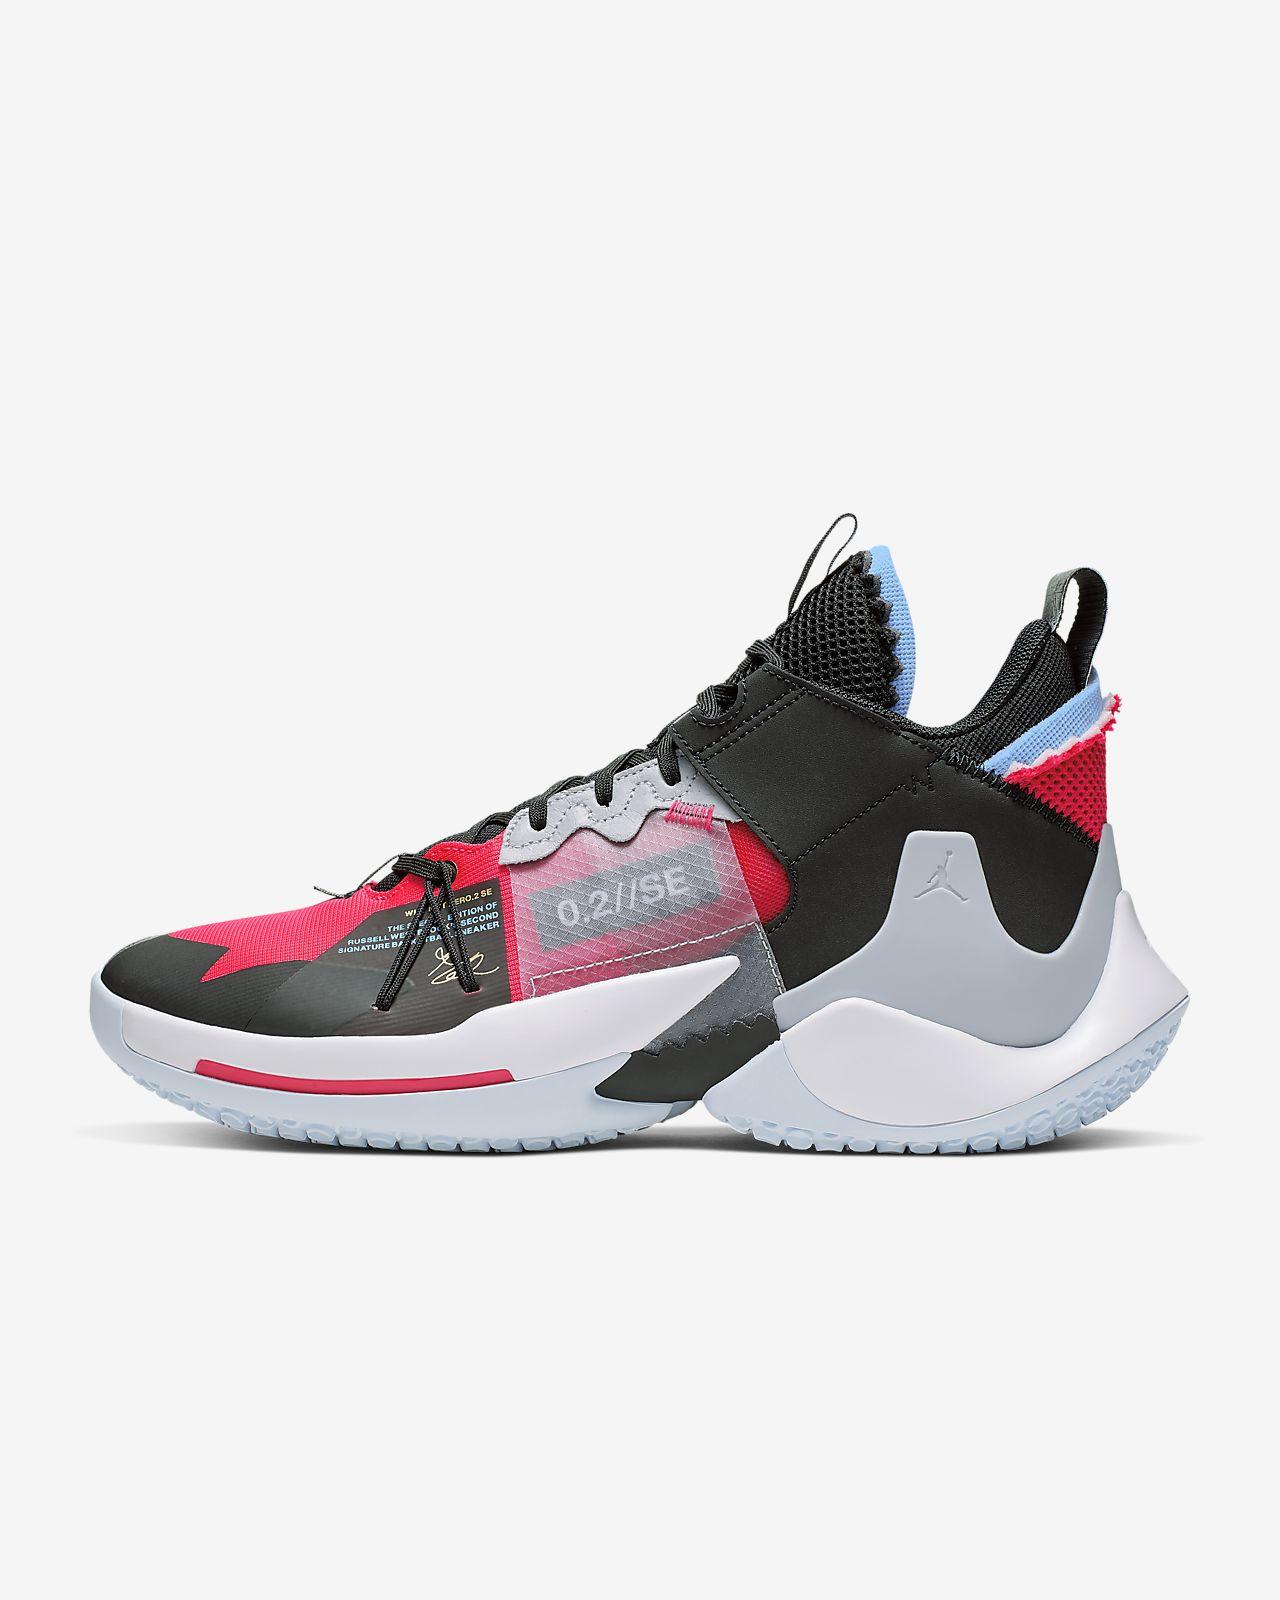 Jordan 'Why Not?' Zer0.2 SE Basketbalschoen